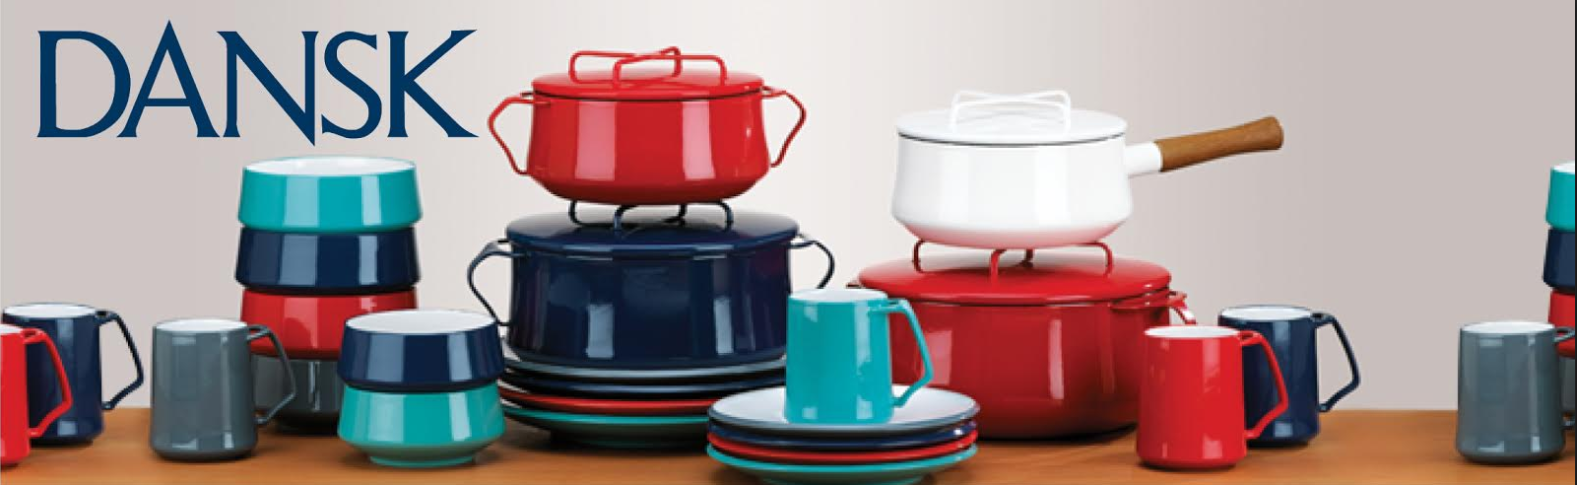 Dansk Kobenstyle Danks Kobenstyle Saucepan Cookware Mug Wood handle & Amazon.com: DANSK Kobenstyle 4-Piece Place Setting Teal: Dinnerware ...